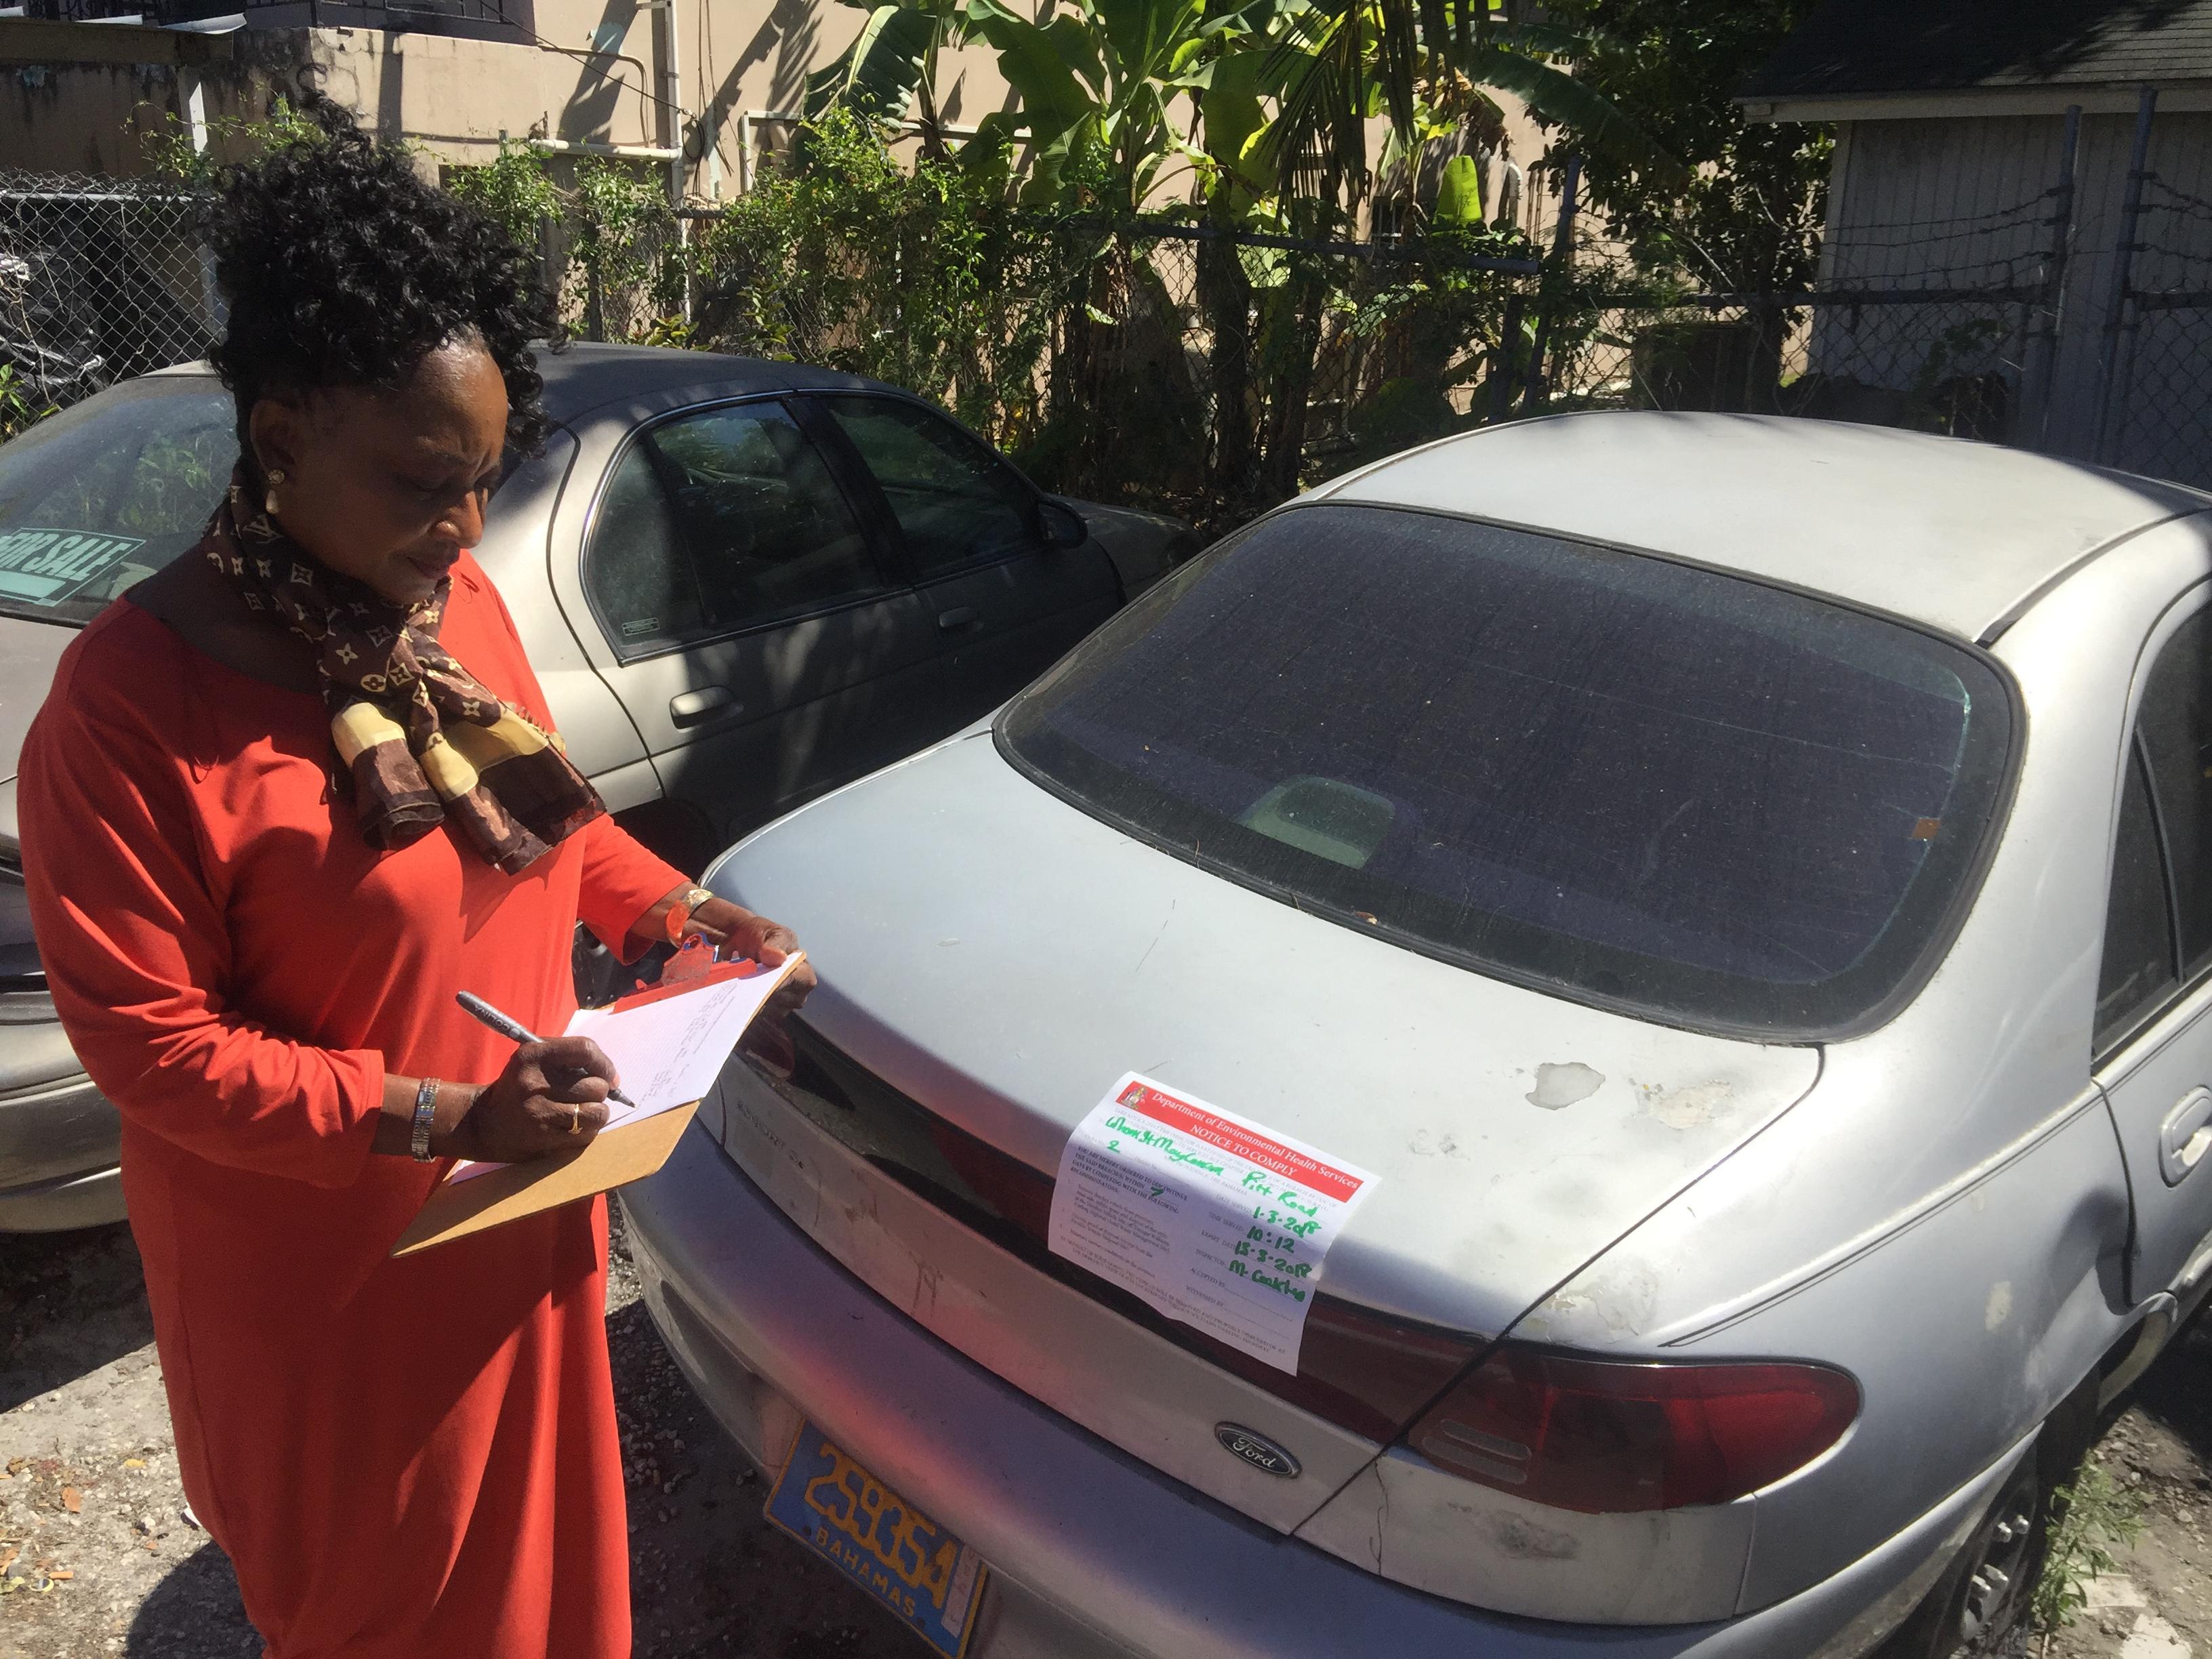 Environmental Health cracks down on derelict vehicles